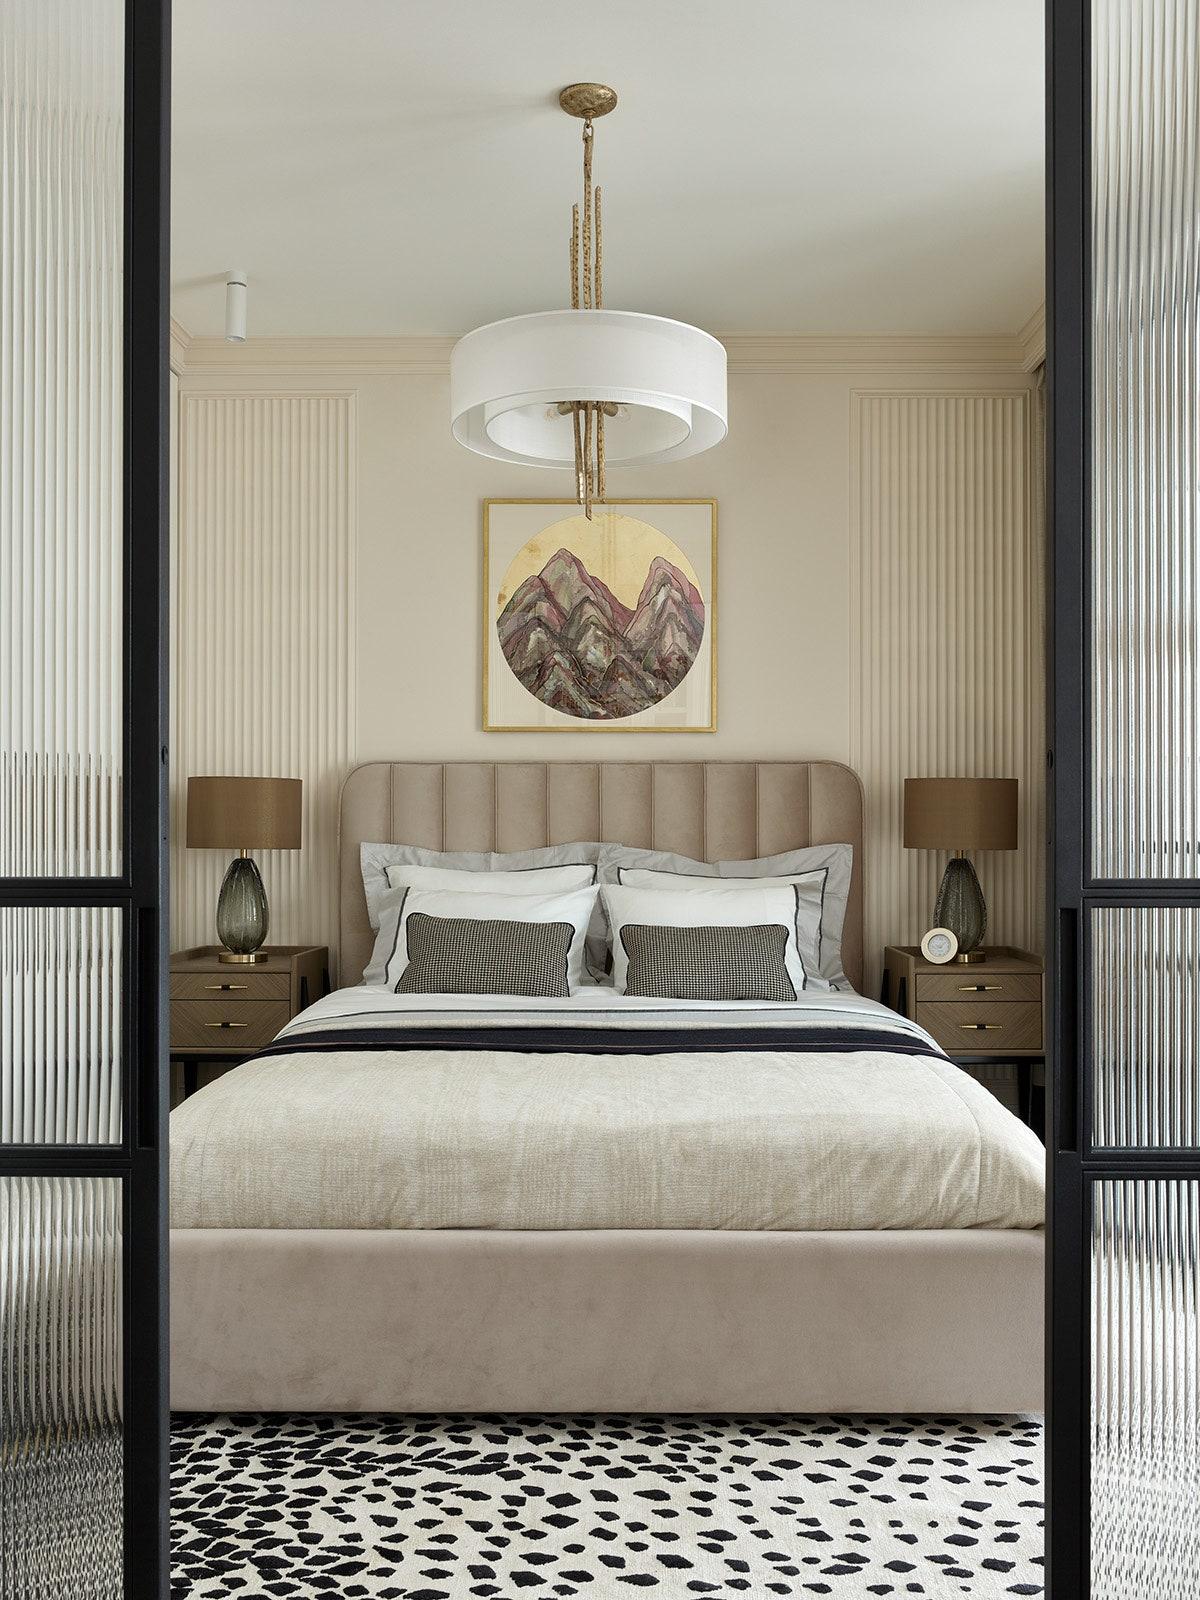 .  Lavsit  Rooma Design  Hinkley     .   Amalia Home Collection     Enere  Art de Vivre  Odadecor   Make Loft.